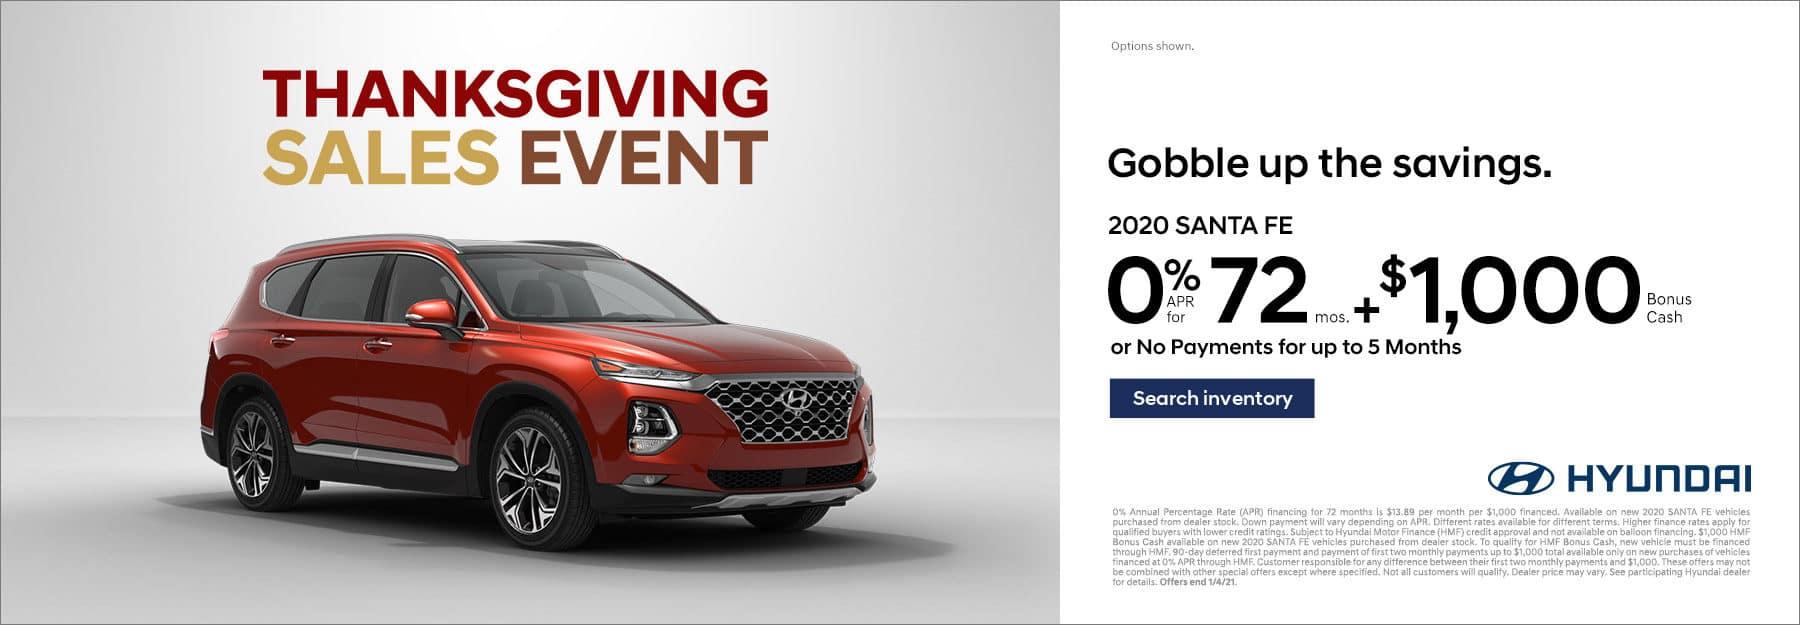 Hyundai Central Region Thanksgiving Sales Event